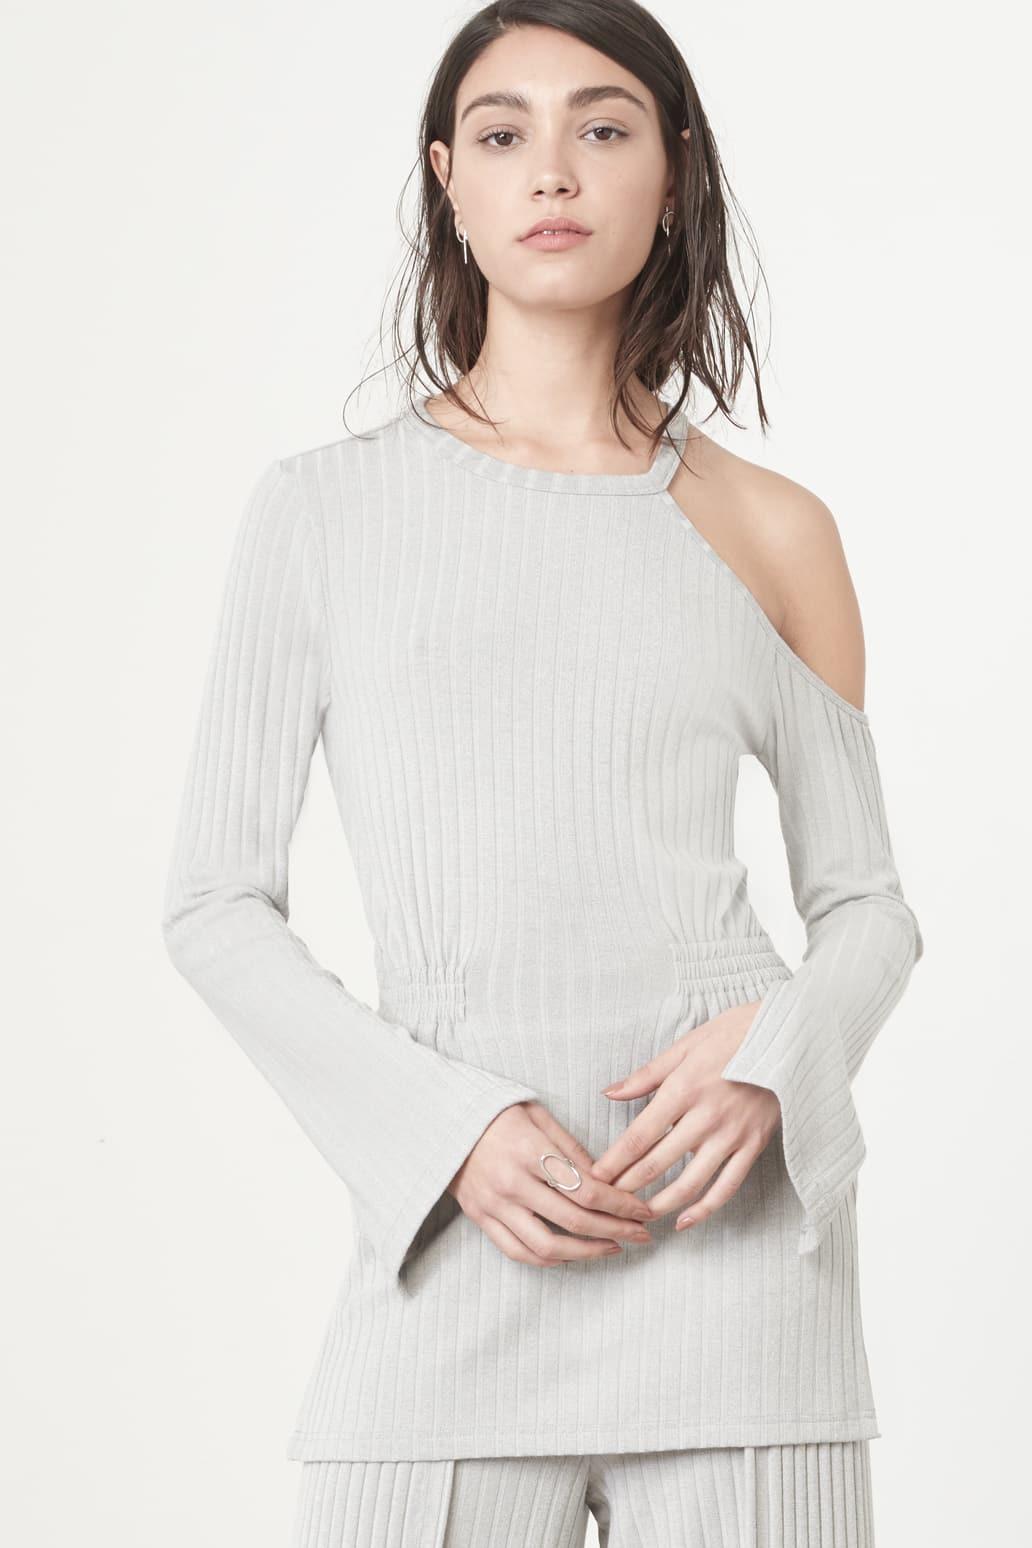 Cutaway Asymmetric Tunic Top in Grey Knit